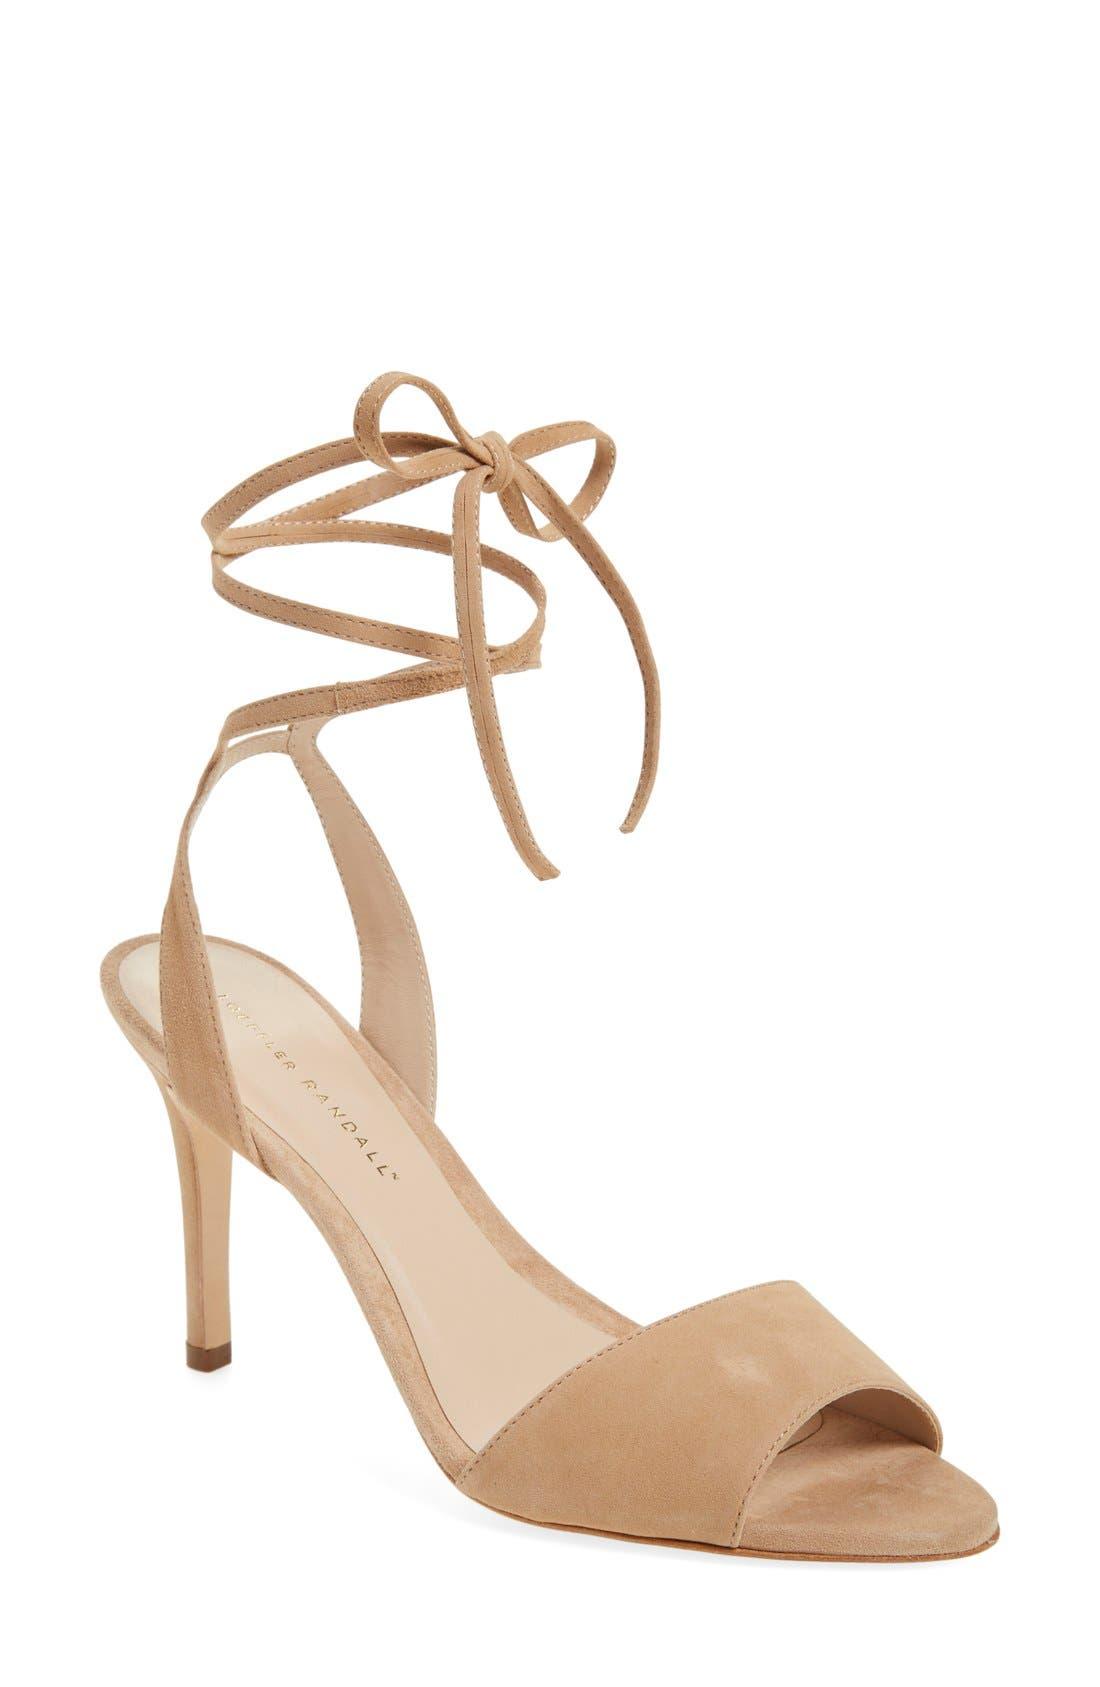 Main Image - Loeffler Randall 'Elyse' Lace-Up Sandal (Women)